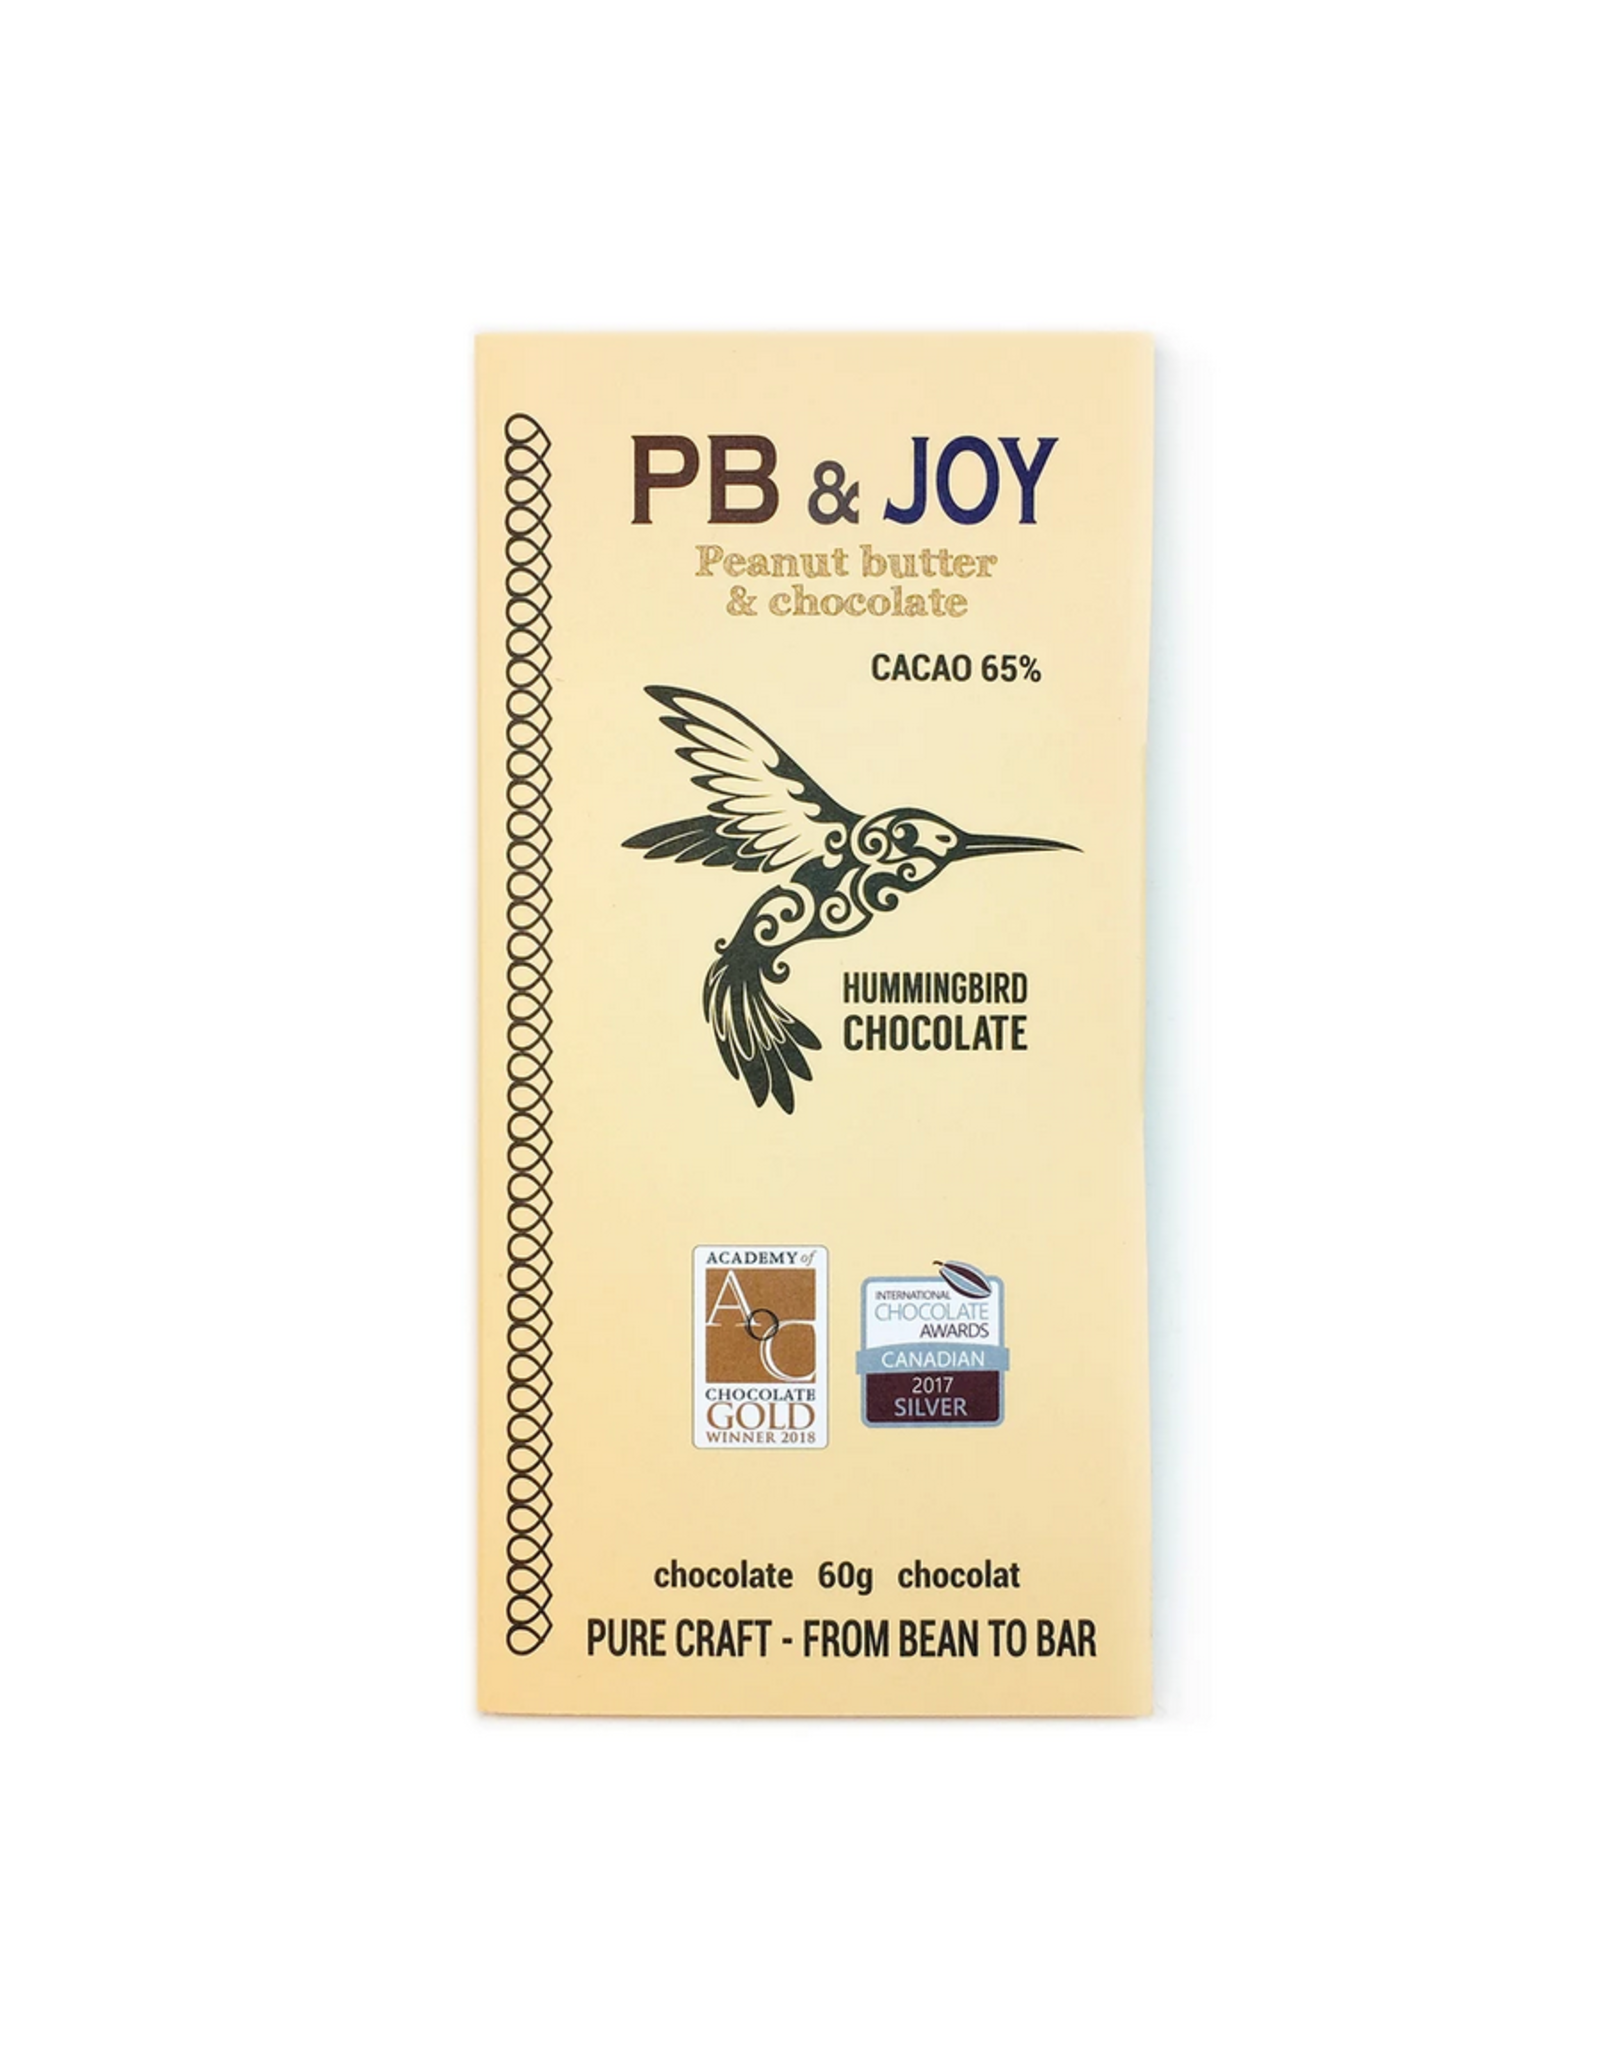 Hummingbird Chocolate Hummingbird Chocolate, PB & Joy, 60g